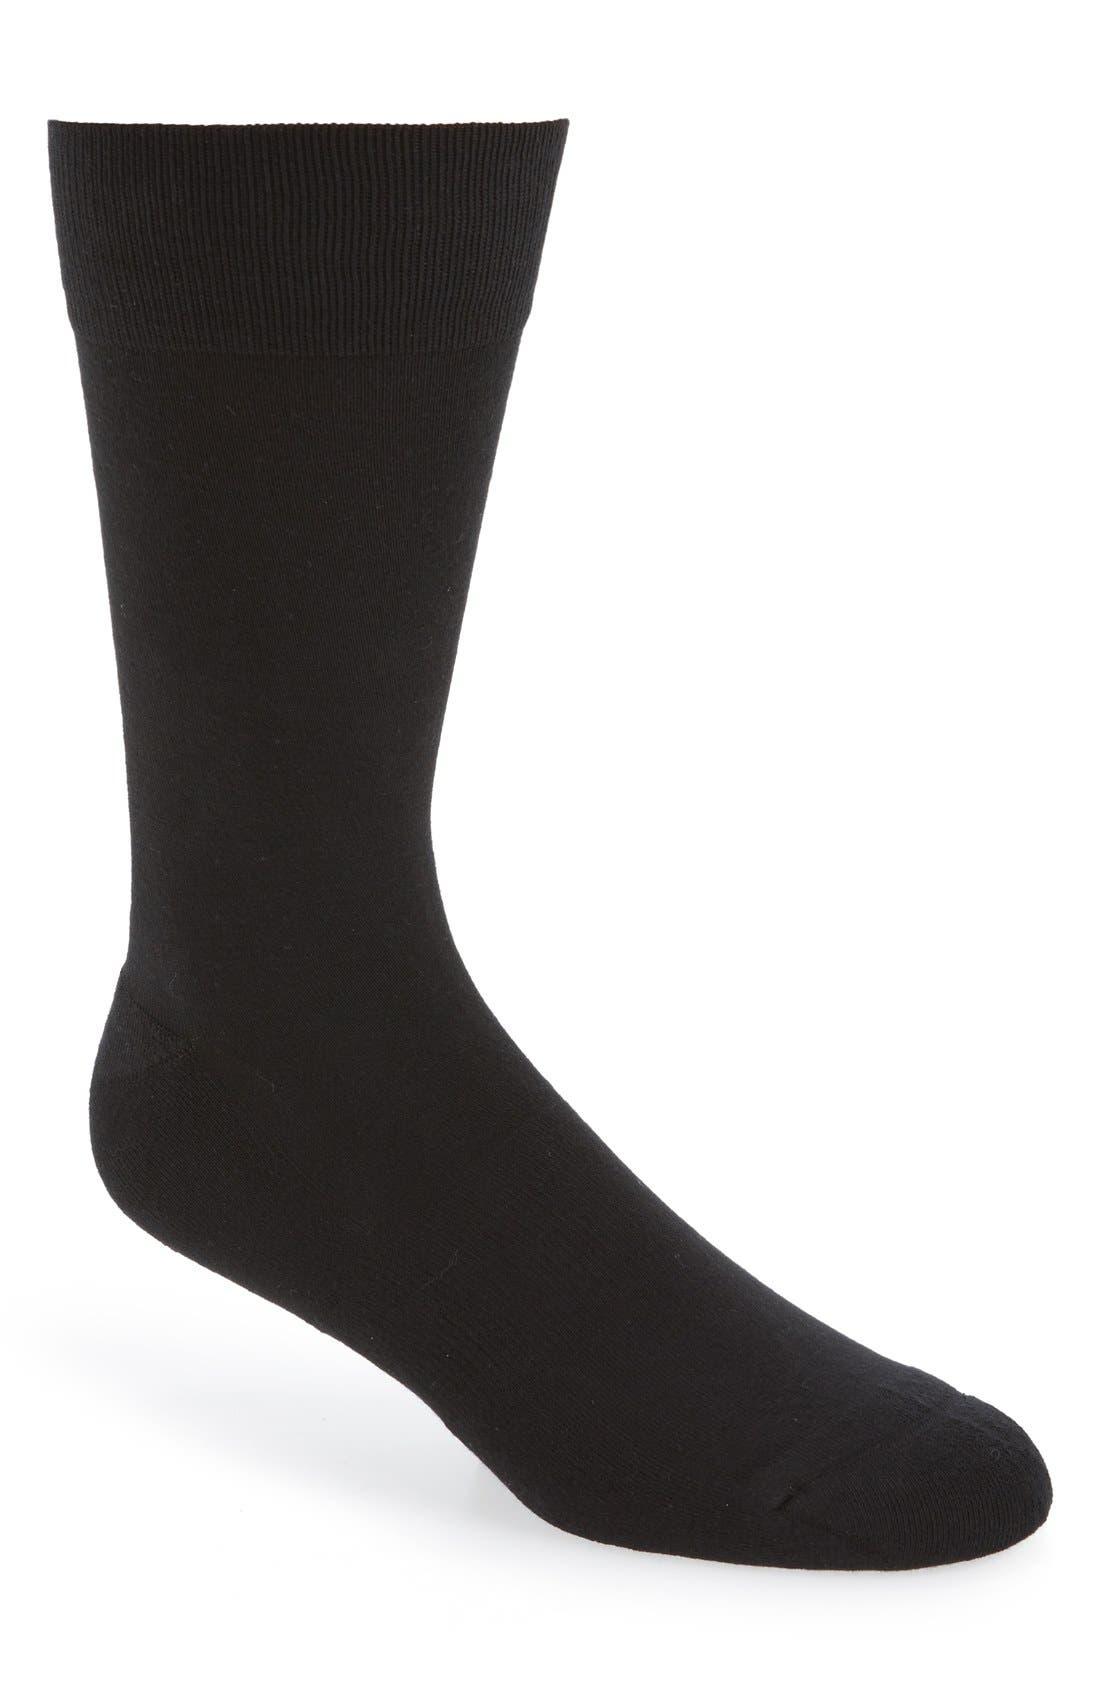 Cushion Foot Arch Support Socks,                             Main thumbnail 1, color,                             001